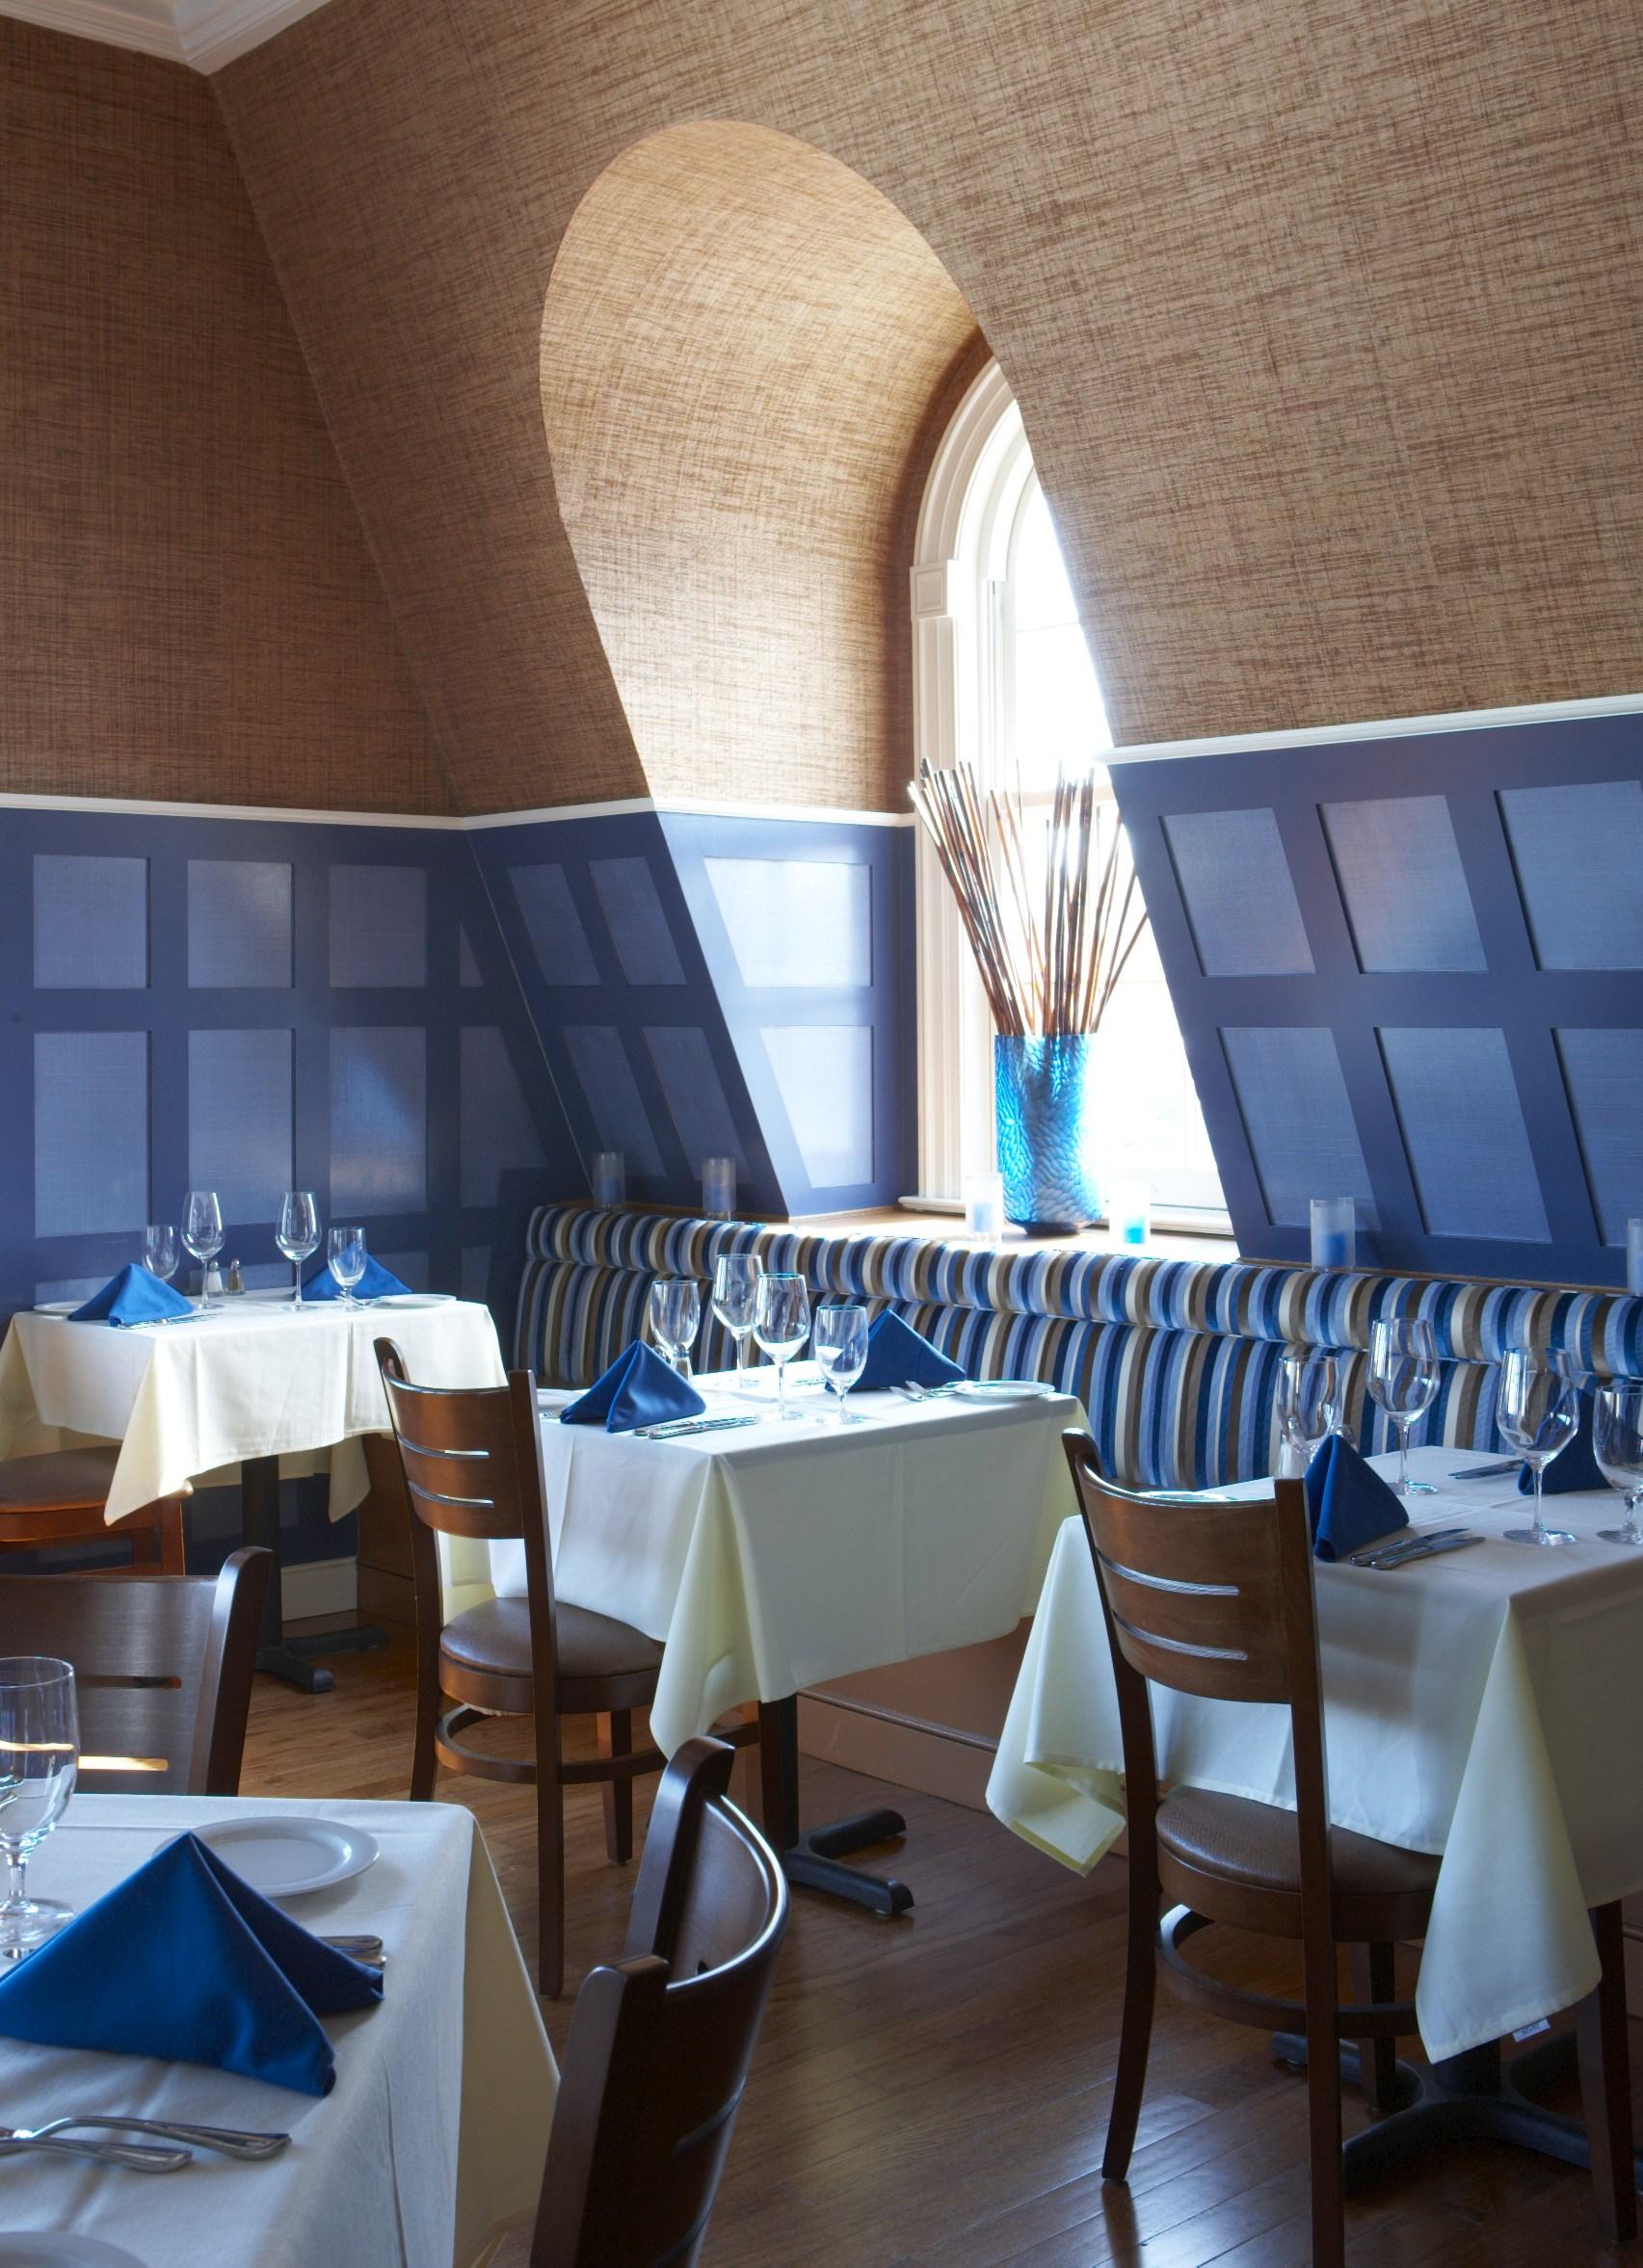 Chatsworth House Room: Wainscot Solutions, Inc